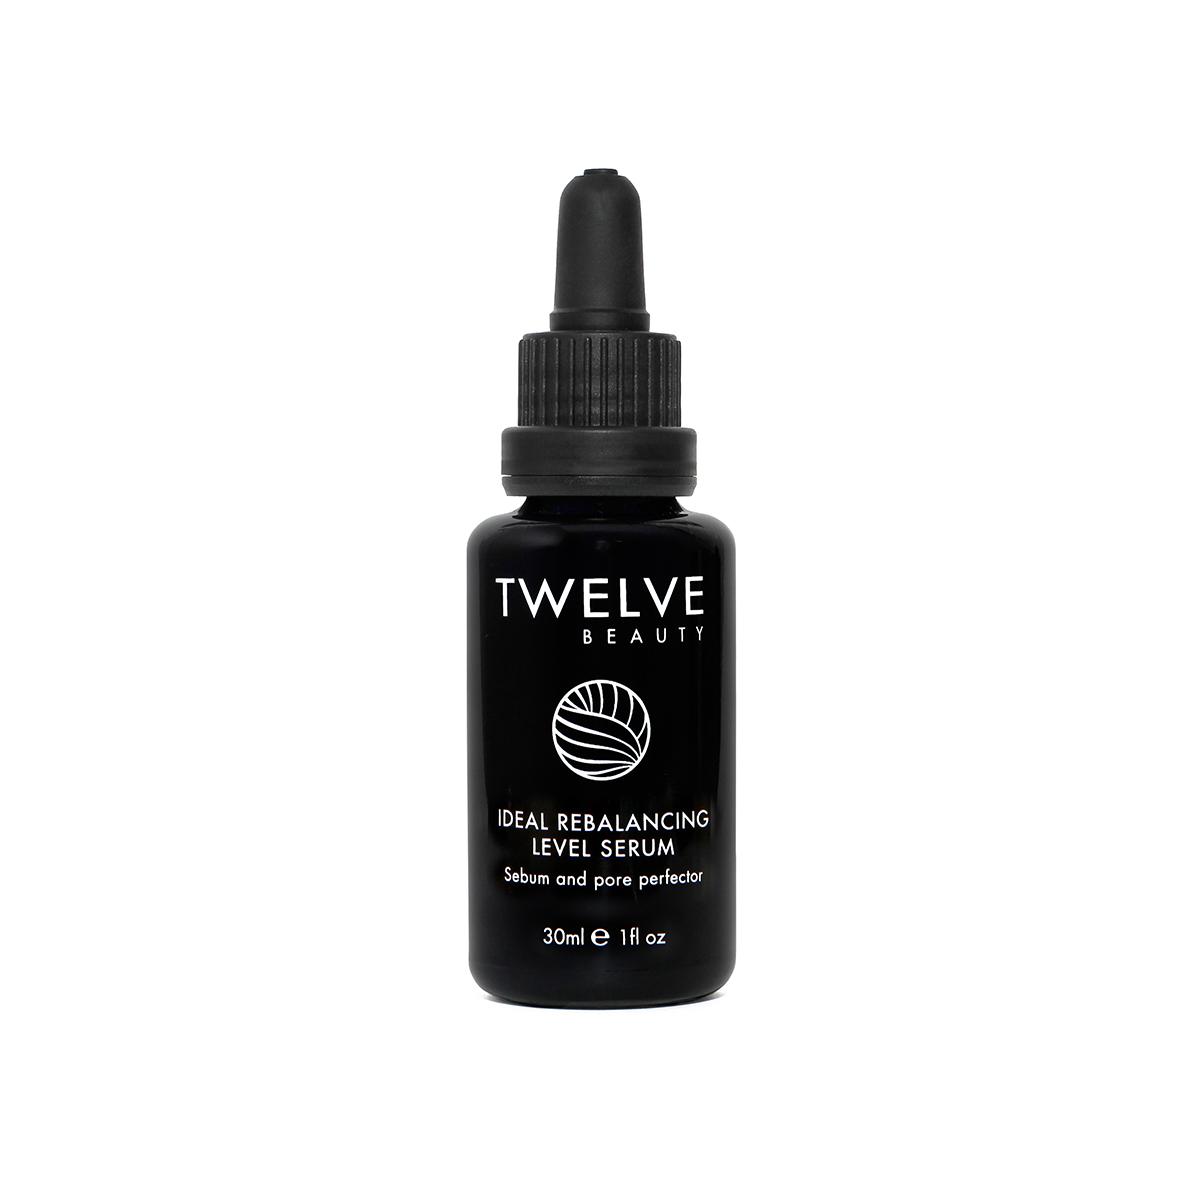 Twelve Beauty Ideal Rebalancing Level Serum